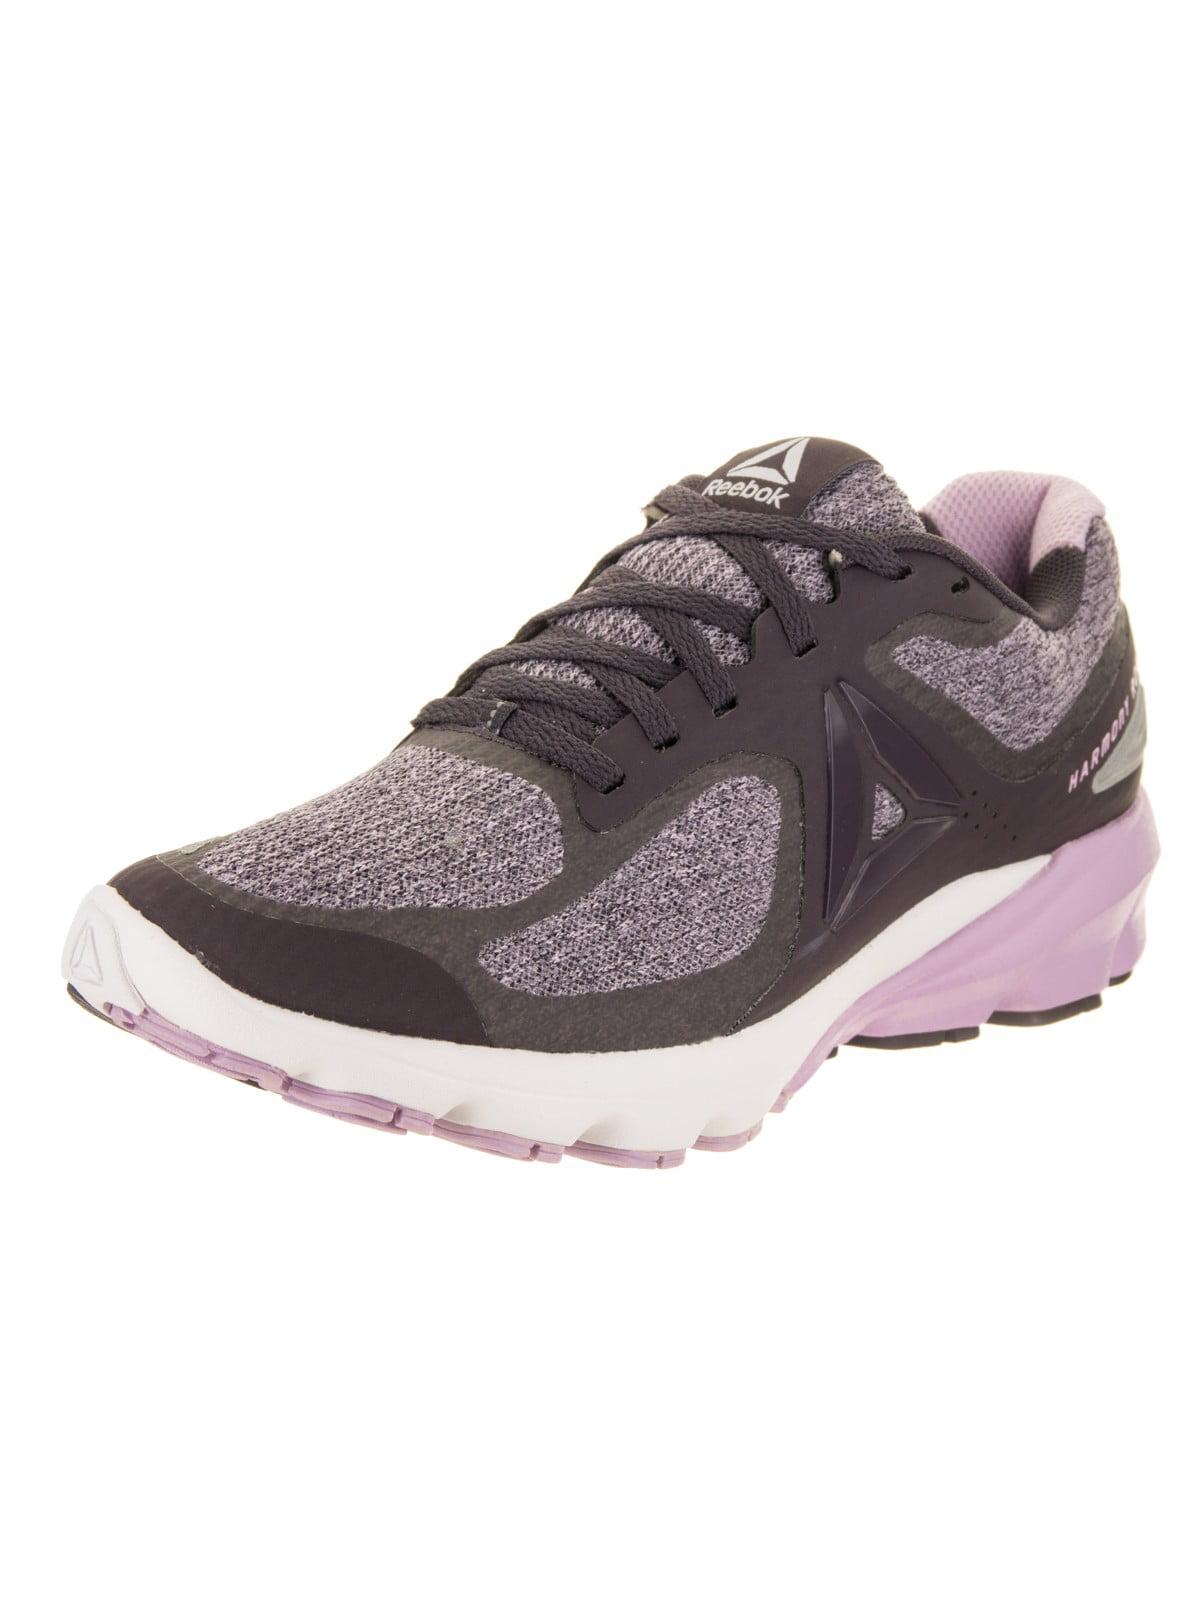 Reebok Women's Harmony Road 2 Running Shoe